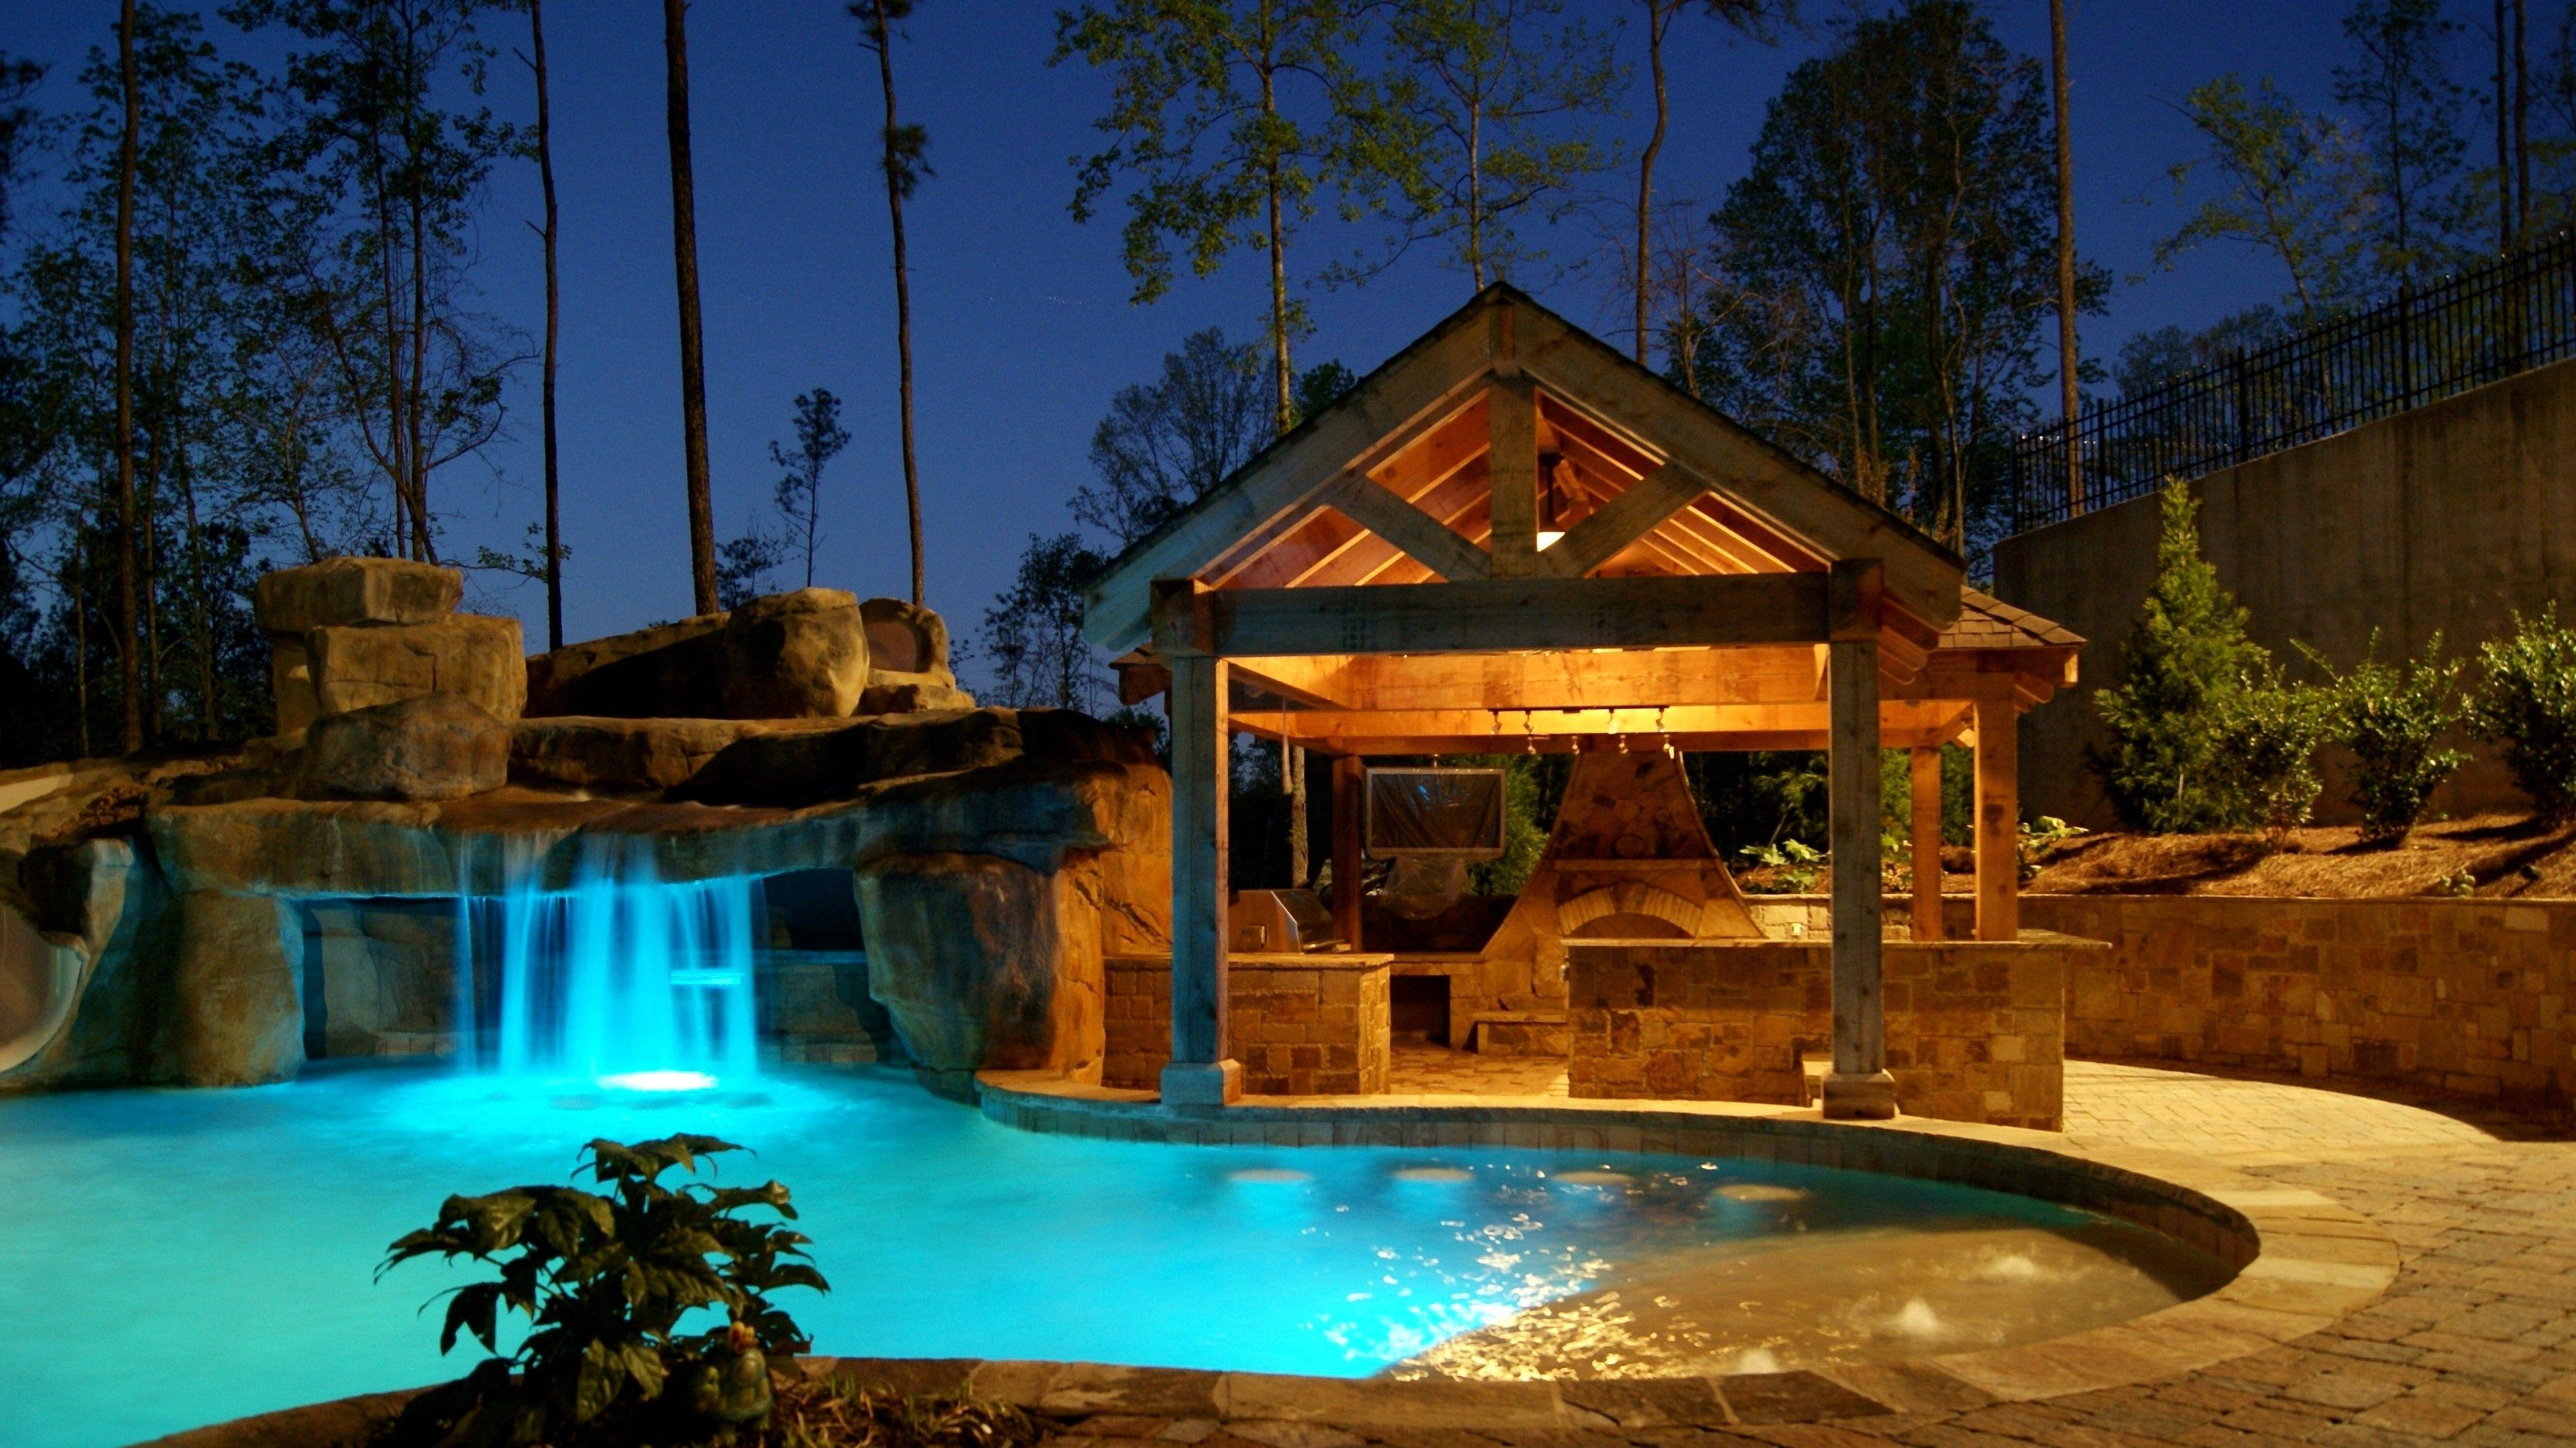 Georgia Dream Pools - Outdoor Living SpacesGeorgia Dream ...